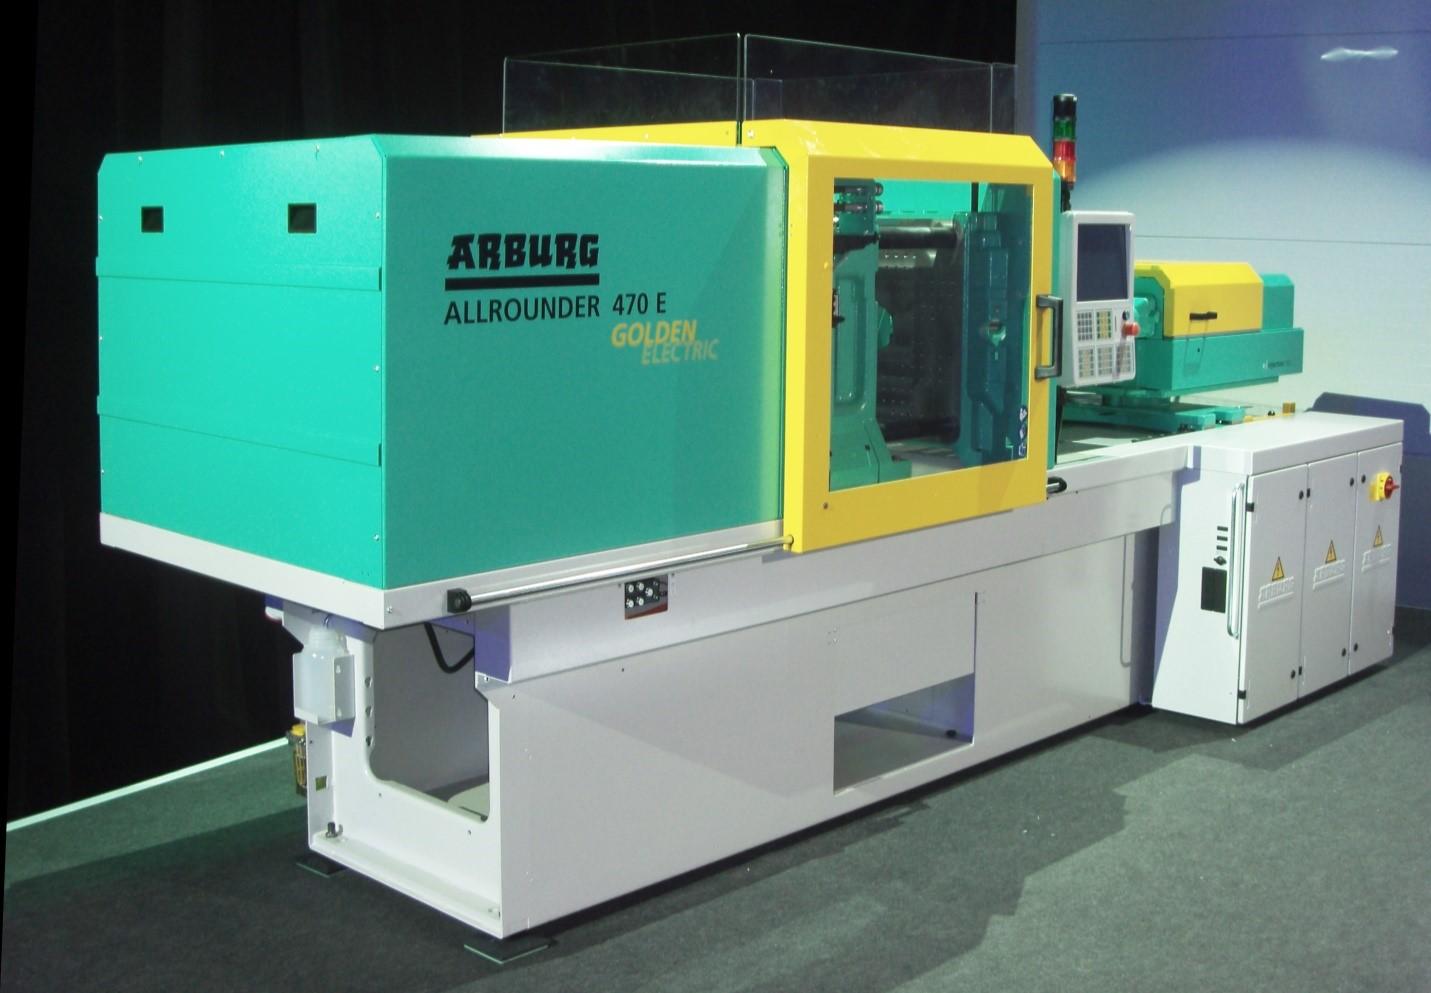 Arburg allrounder 420c machine manual ebook array como funciona uma injetora de pl stico automata do brasil rh automataweb fandeluxe Choice Image